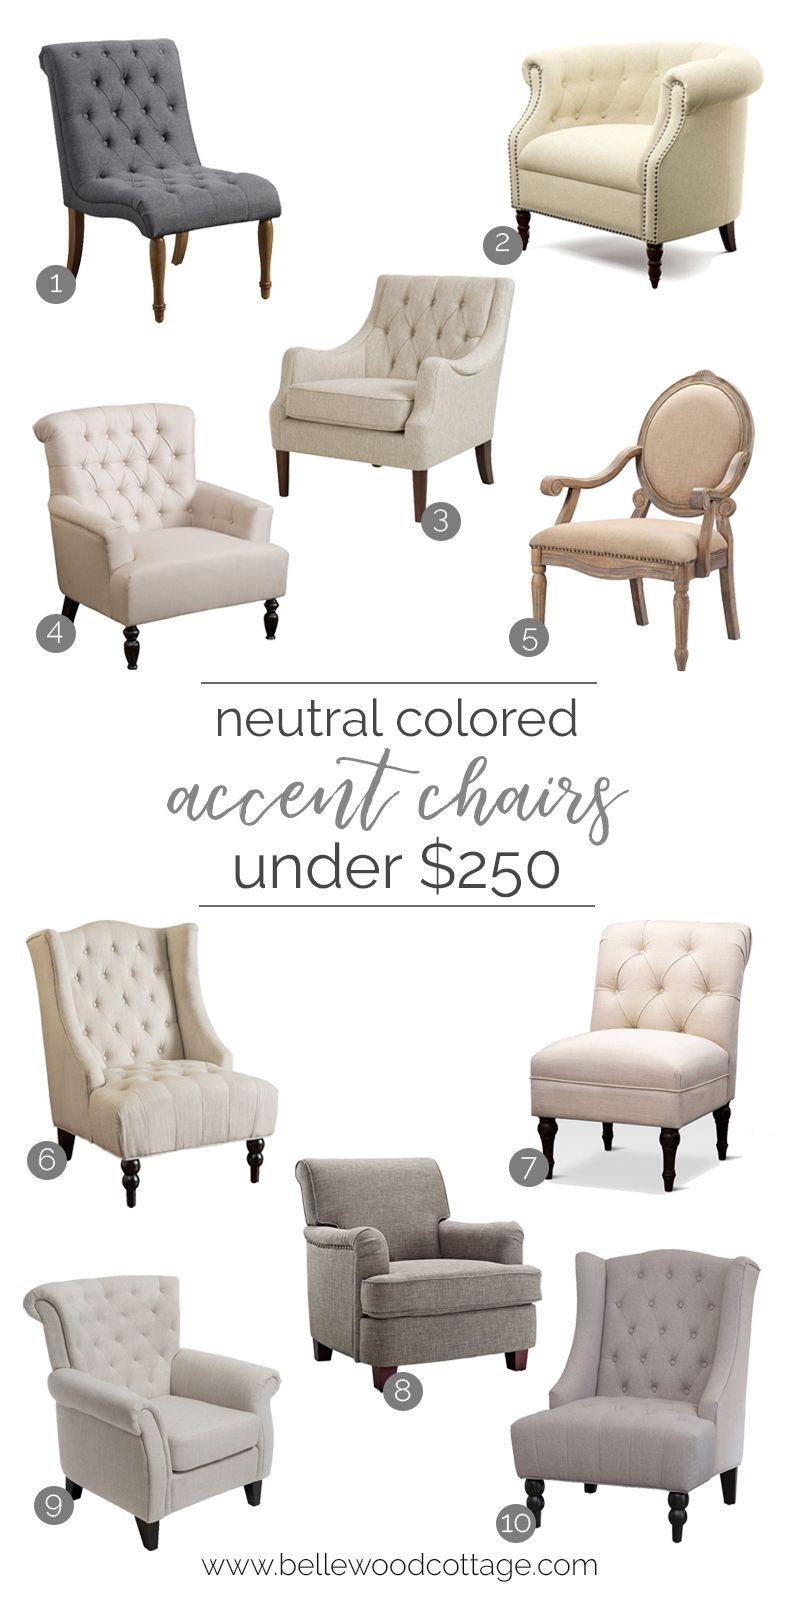 Neutral Accent Chairs Under 250 Elegant Home Decor Home Decor Accessories Home Decor Bedroom